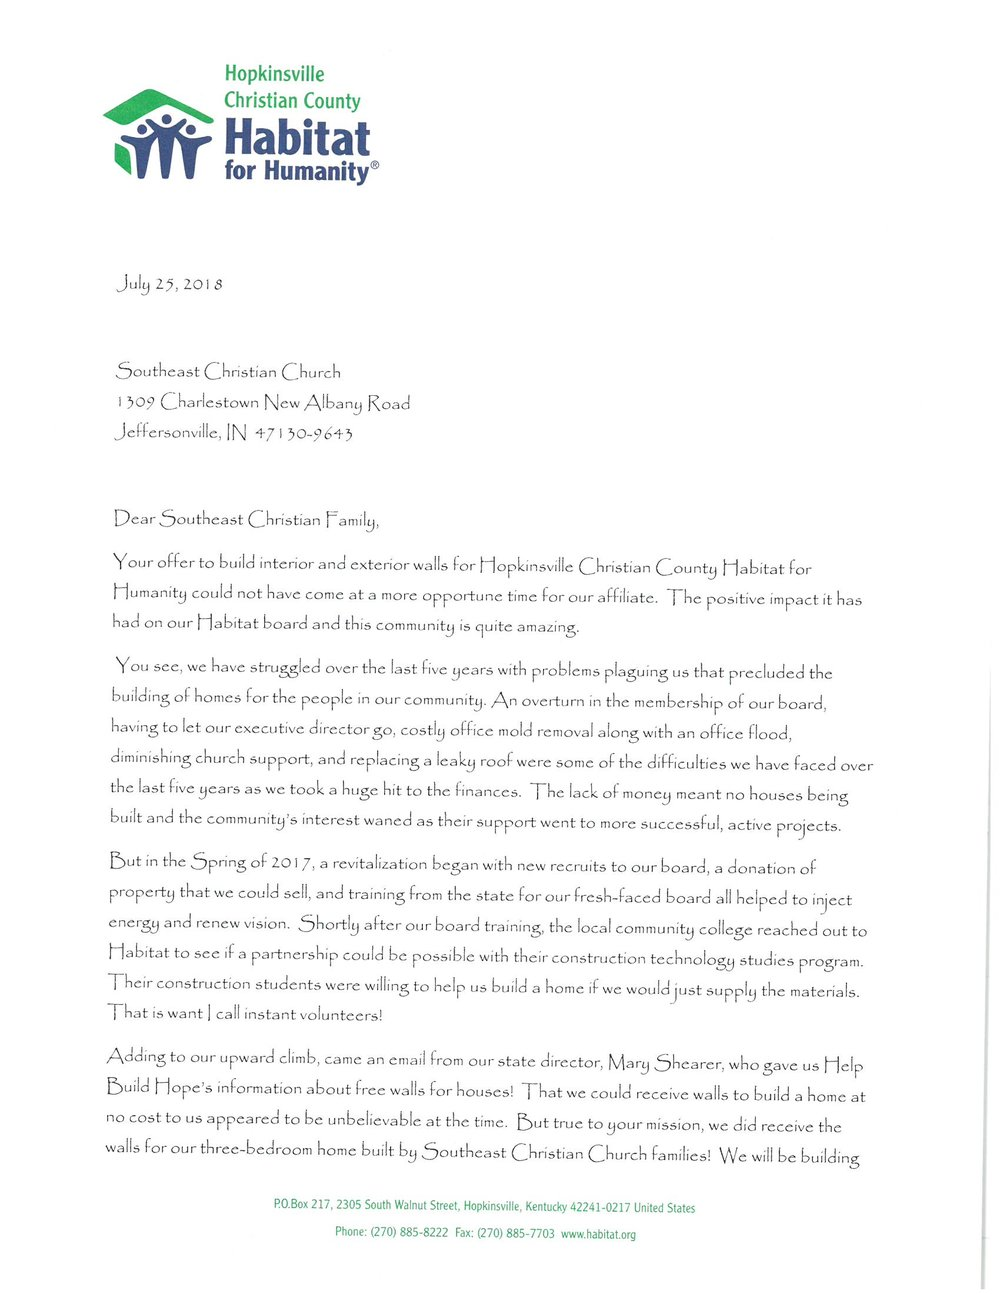 Habitat Letter_Page_1.jpg